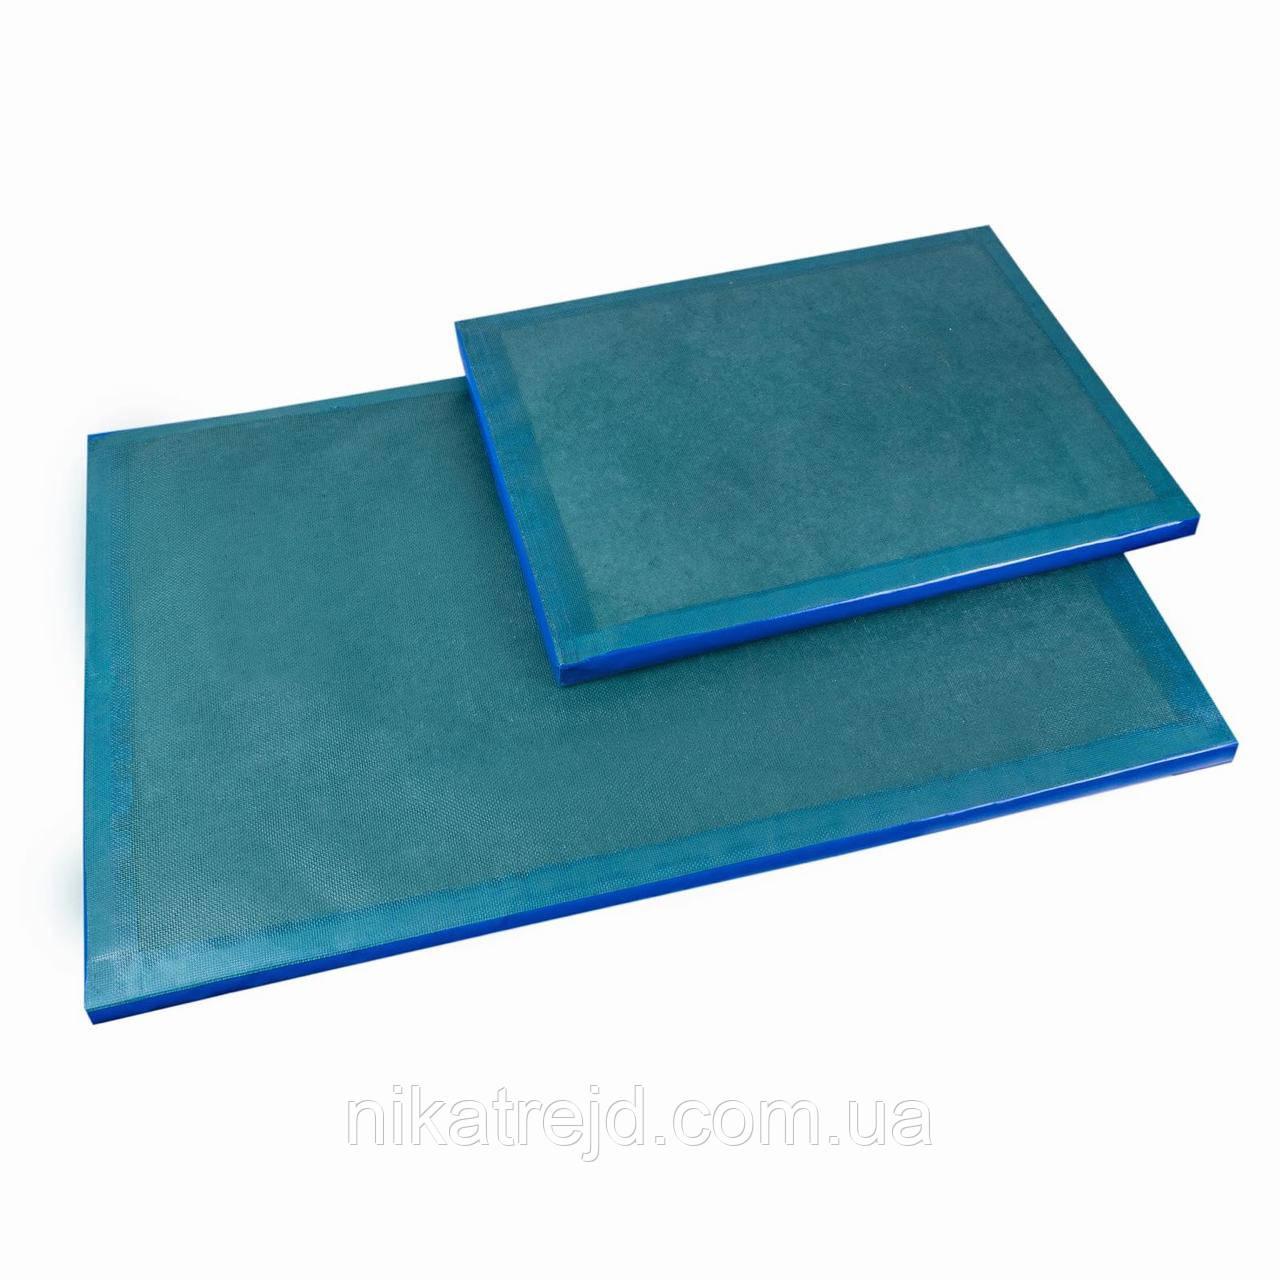 Медицинский дезинфицирующий коврик 100х200х1,5 см